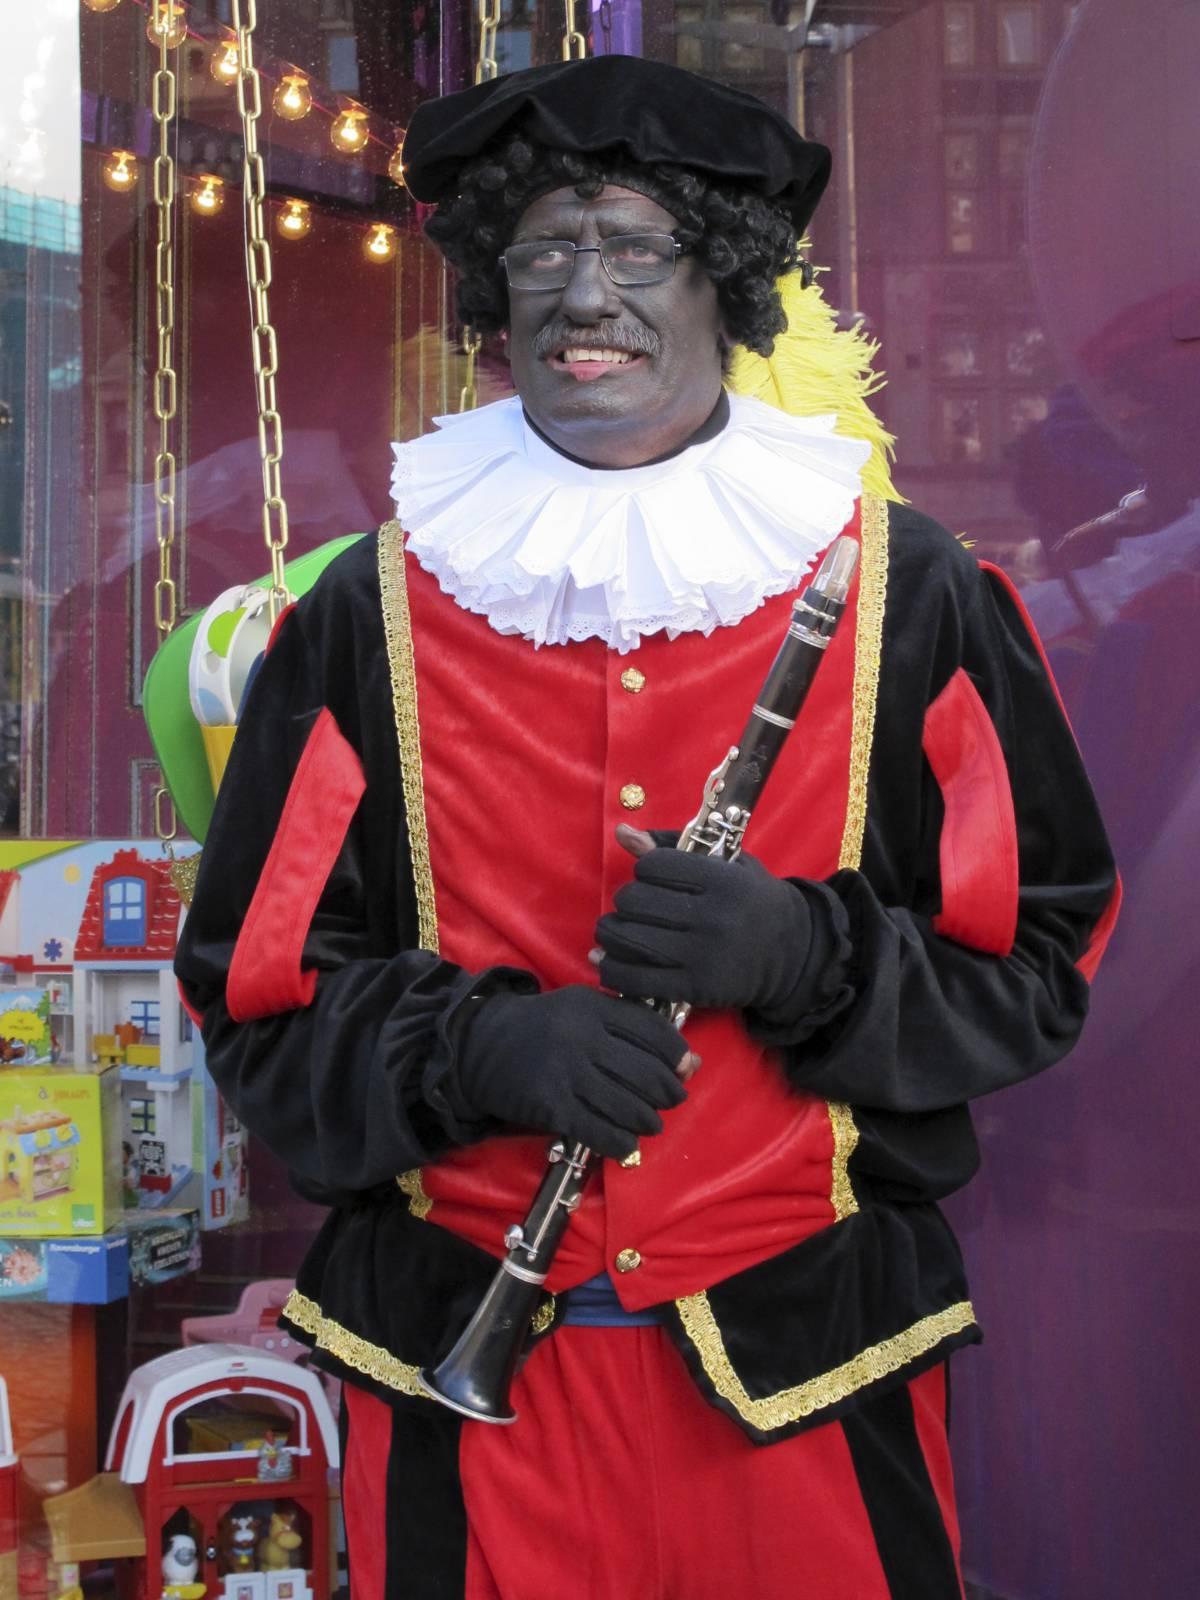 Zwarte Piet nei festeggiamenti per San Nicola